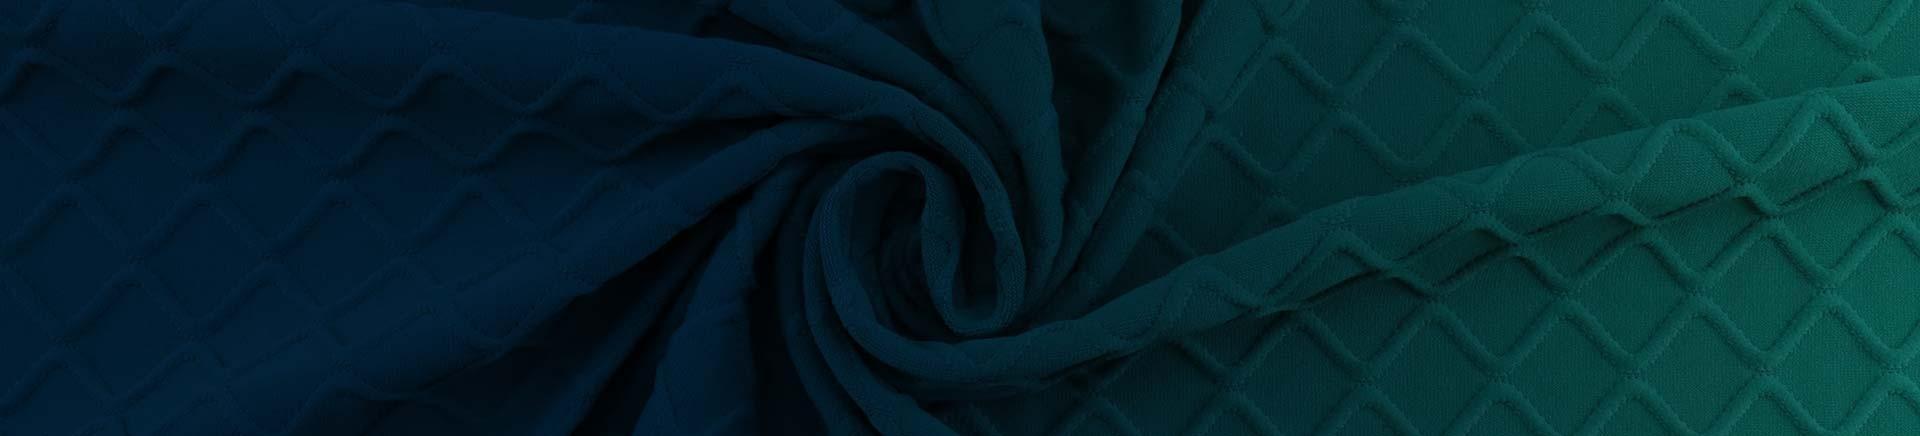 Bambusjersey | JAVRO Stoffmarkt